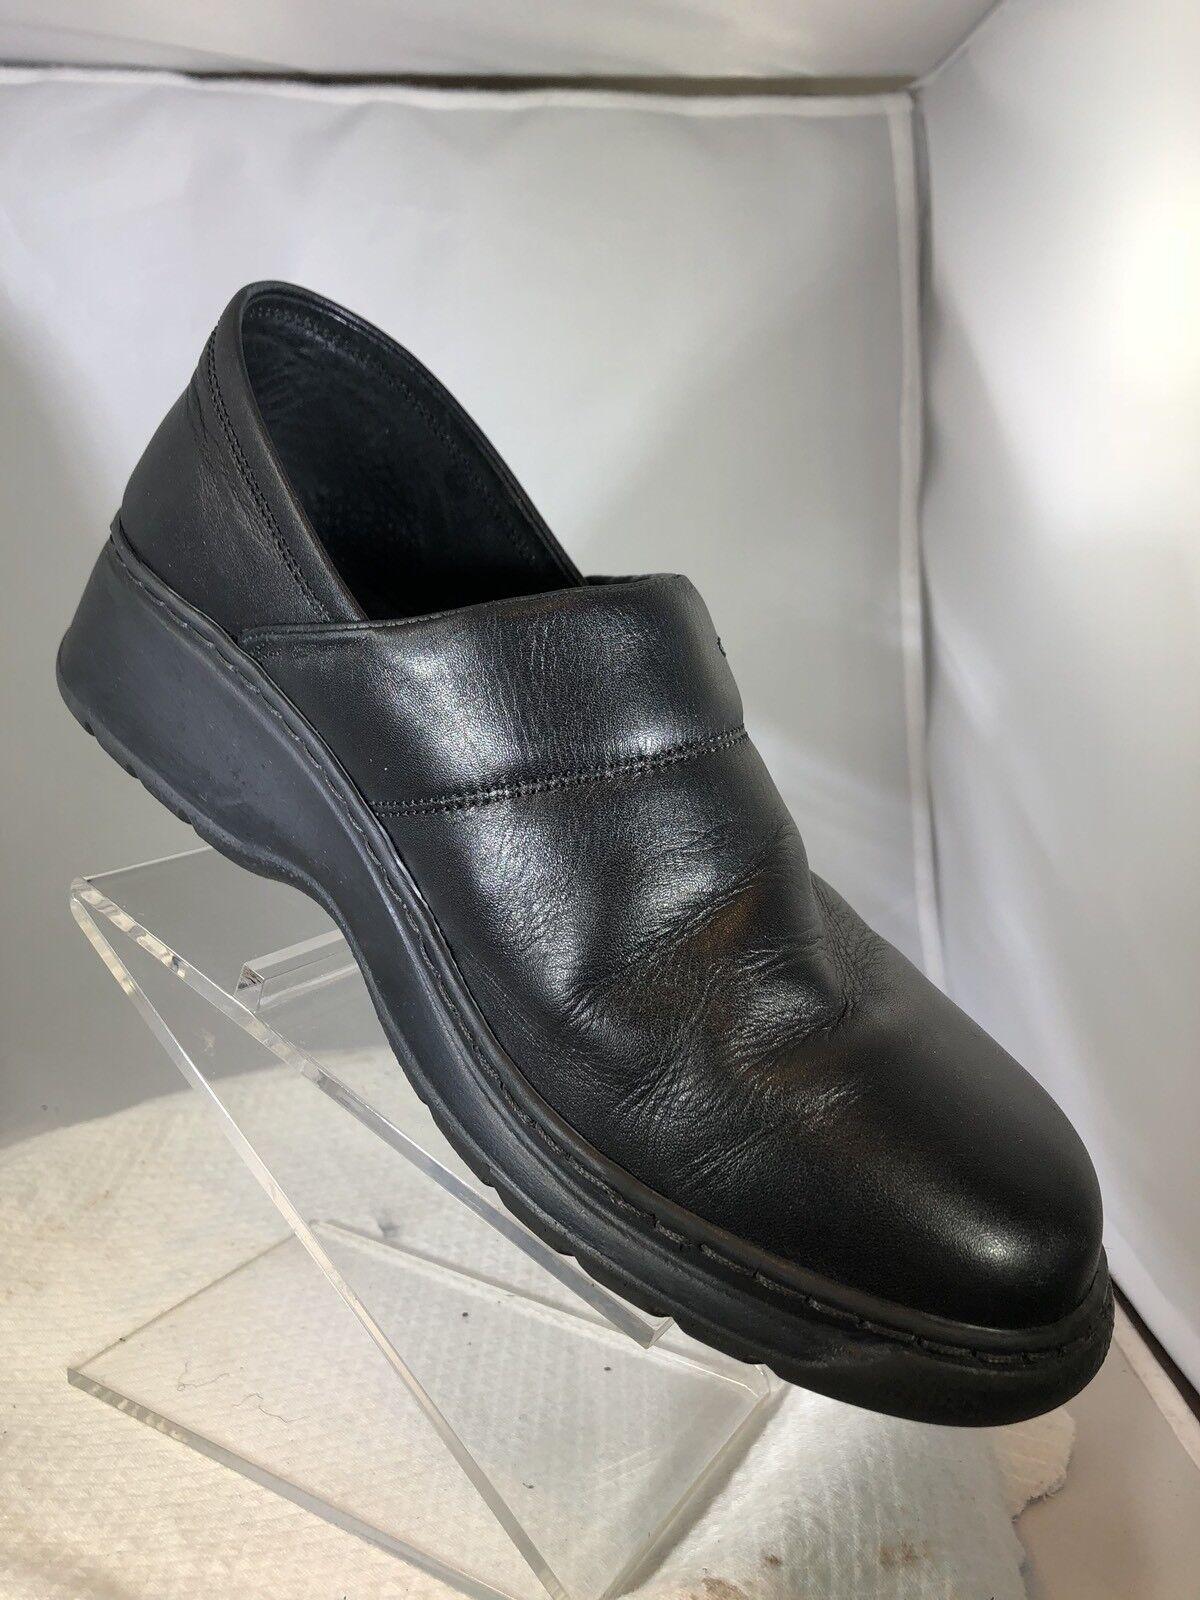 Joseph Seibel Black Clogs Mule Slip On Women shoes Size US 9.5 Euro 40